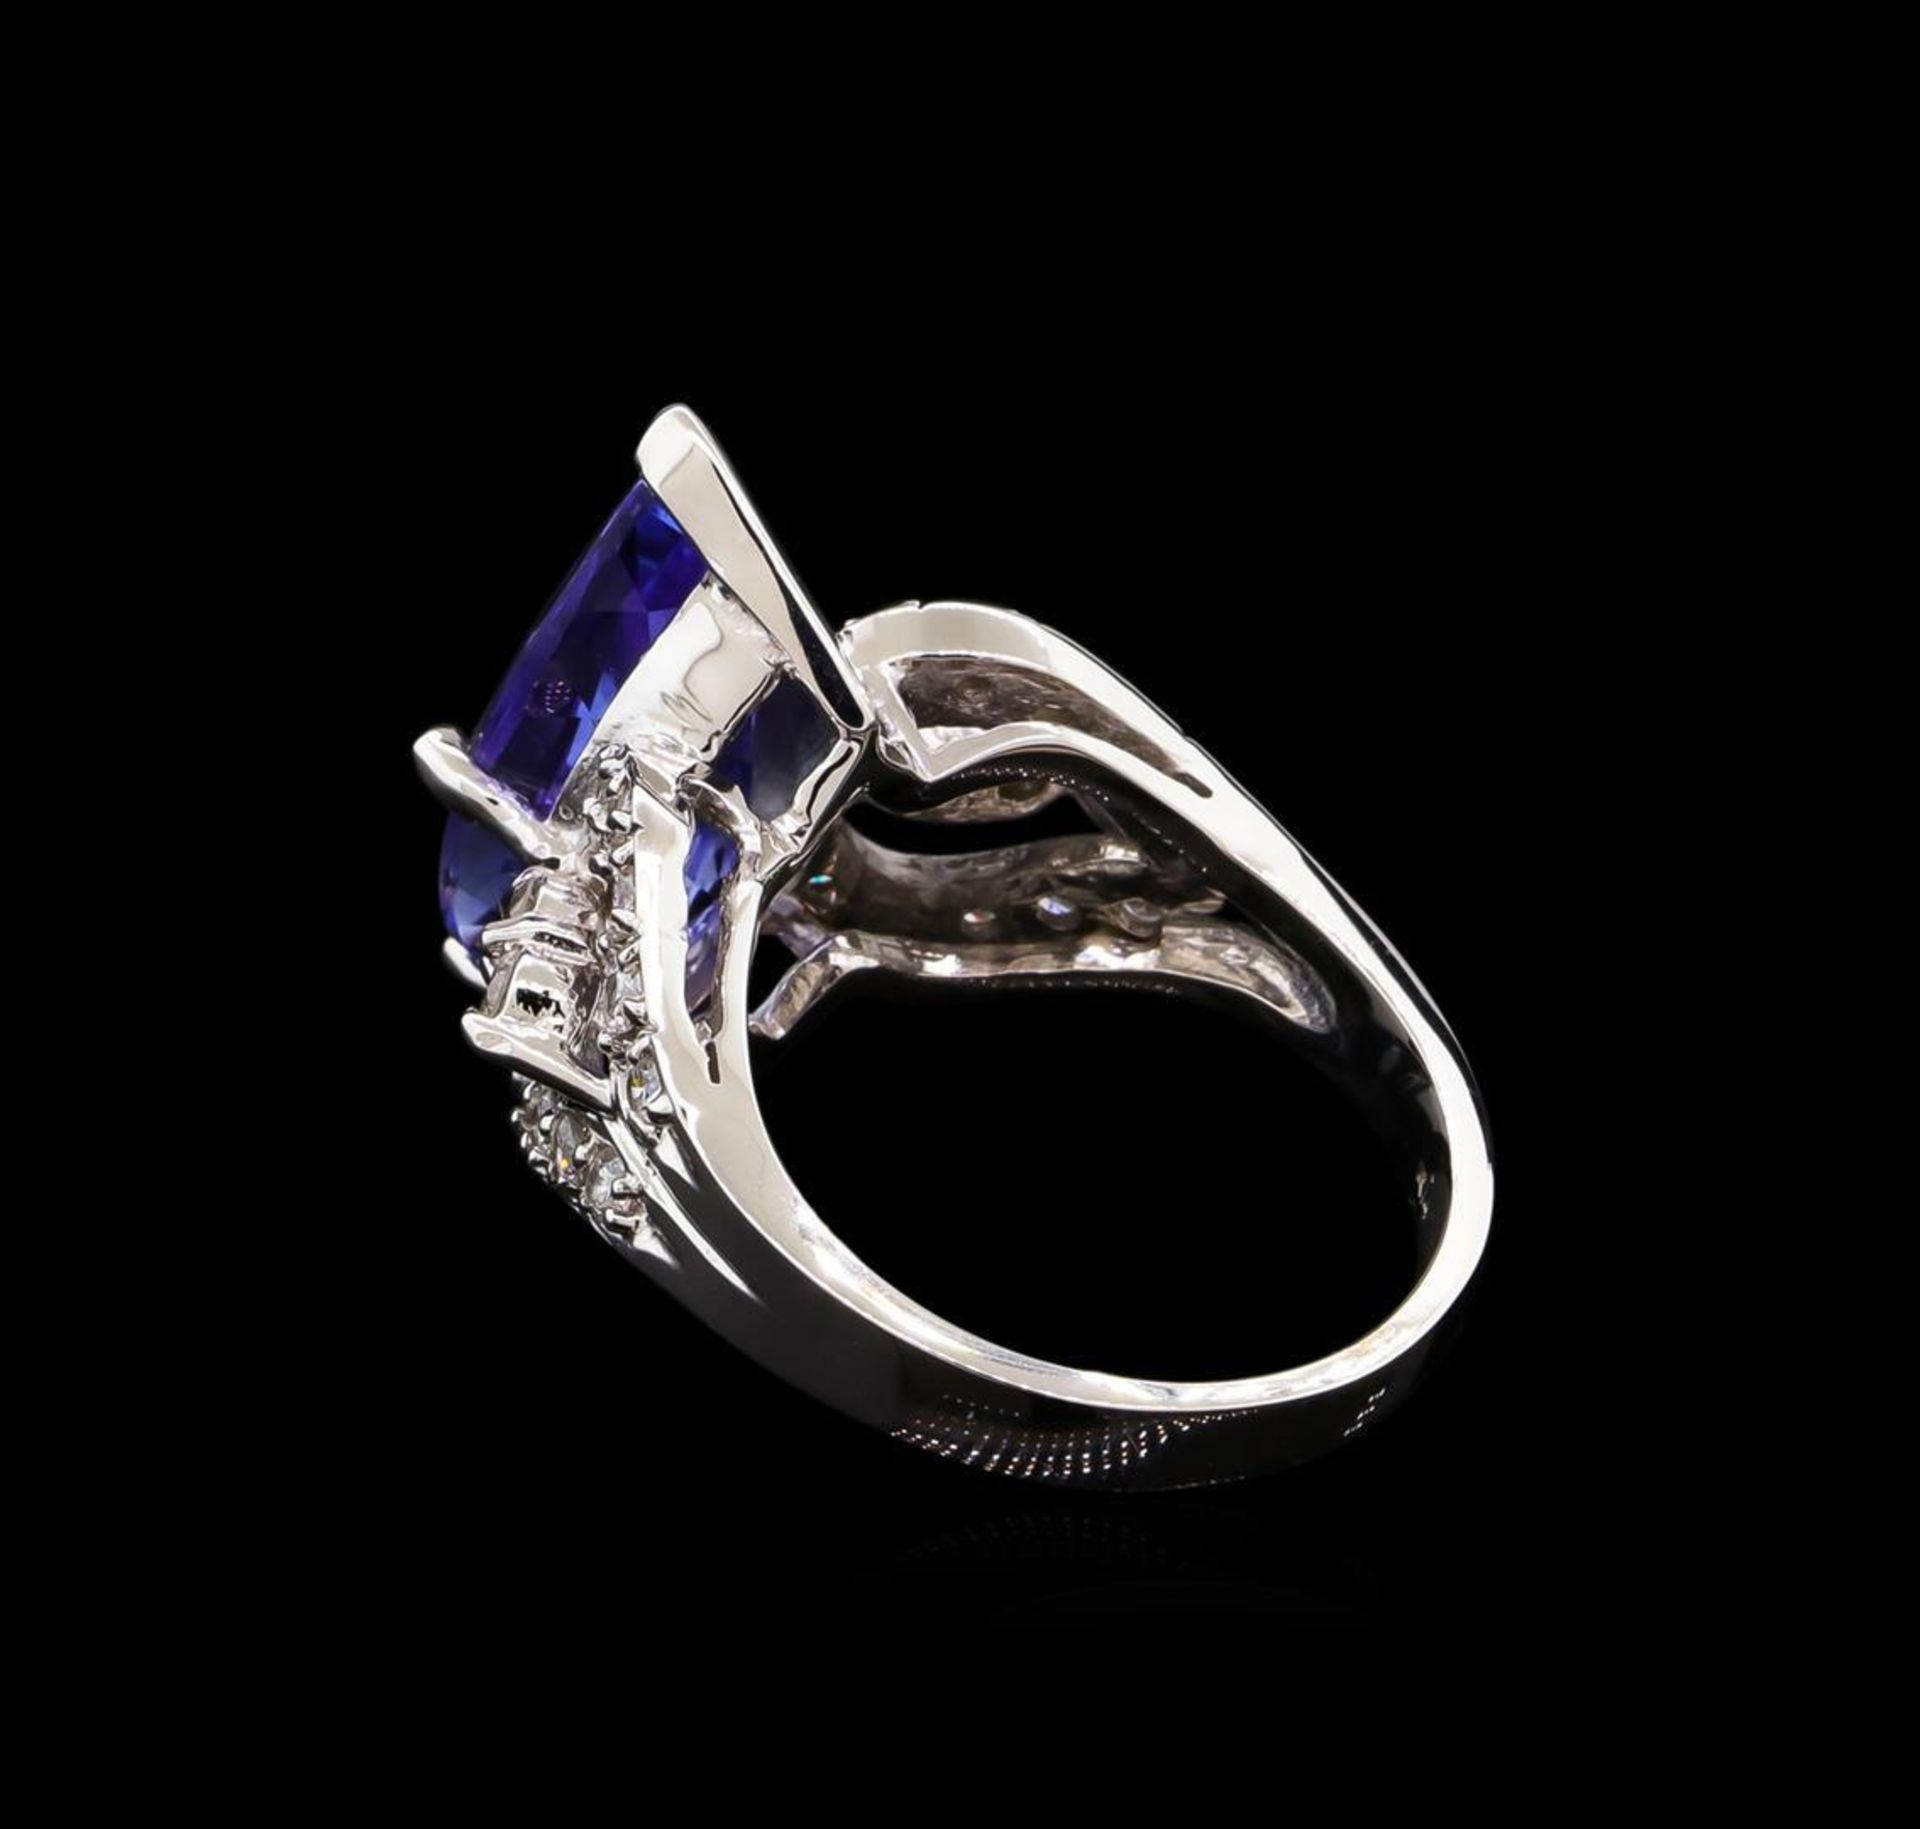 6.70 ctw Tanzanite and Diamond Ring - 14KT White Gold - Image 3 of 5